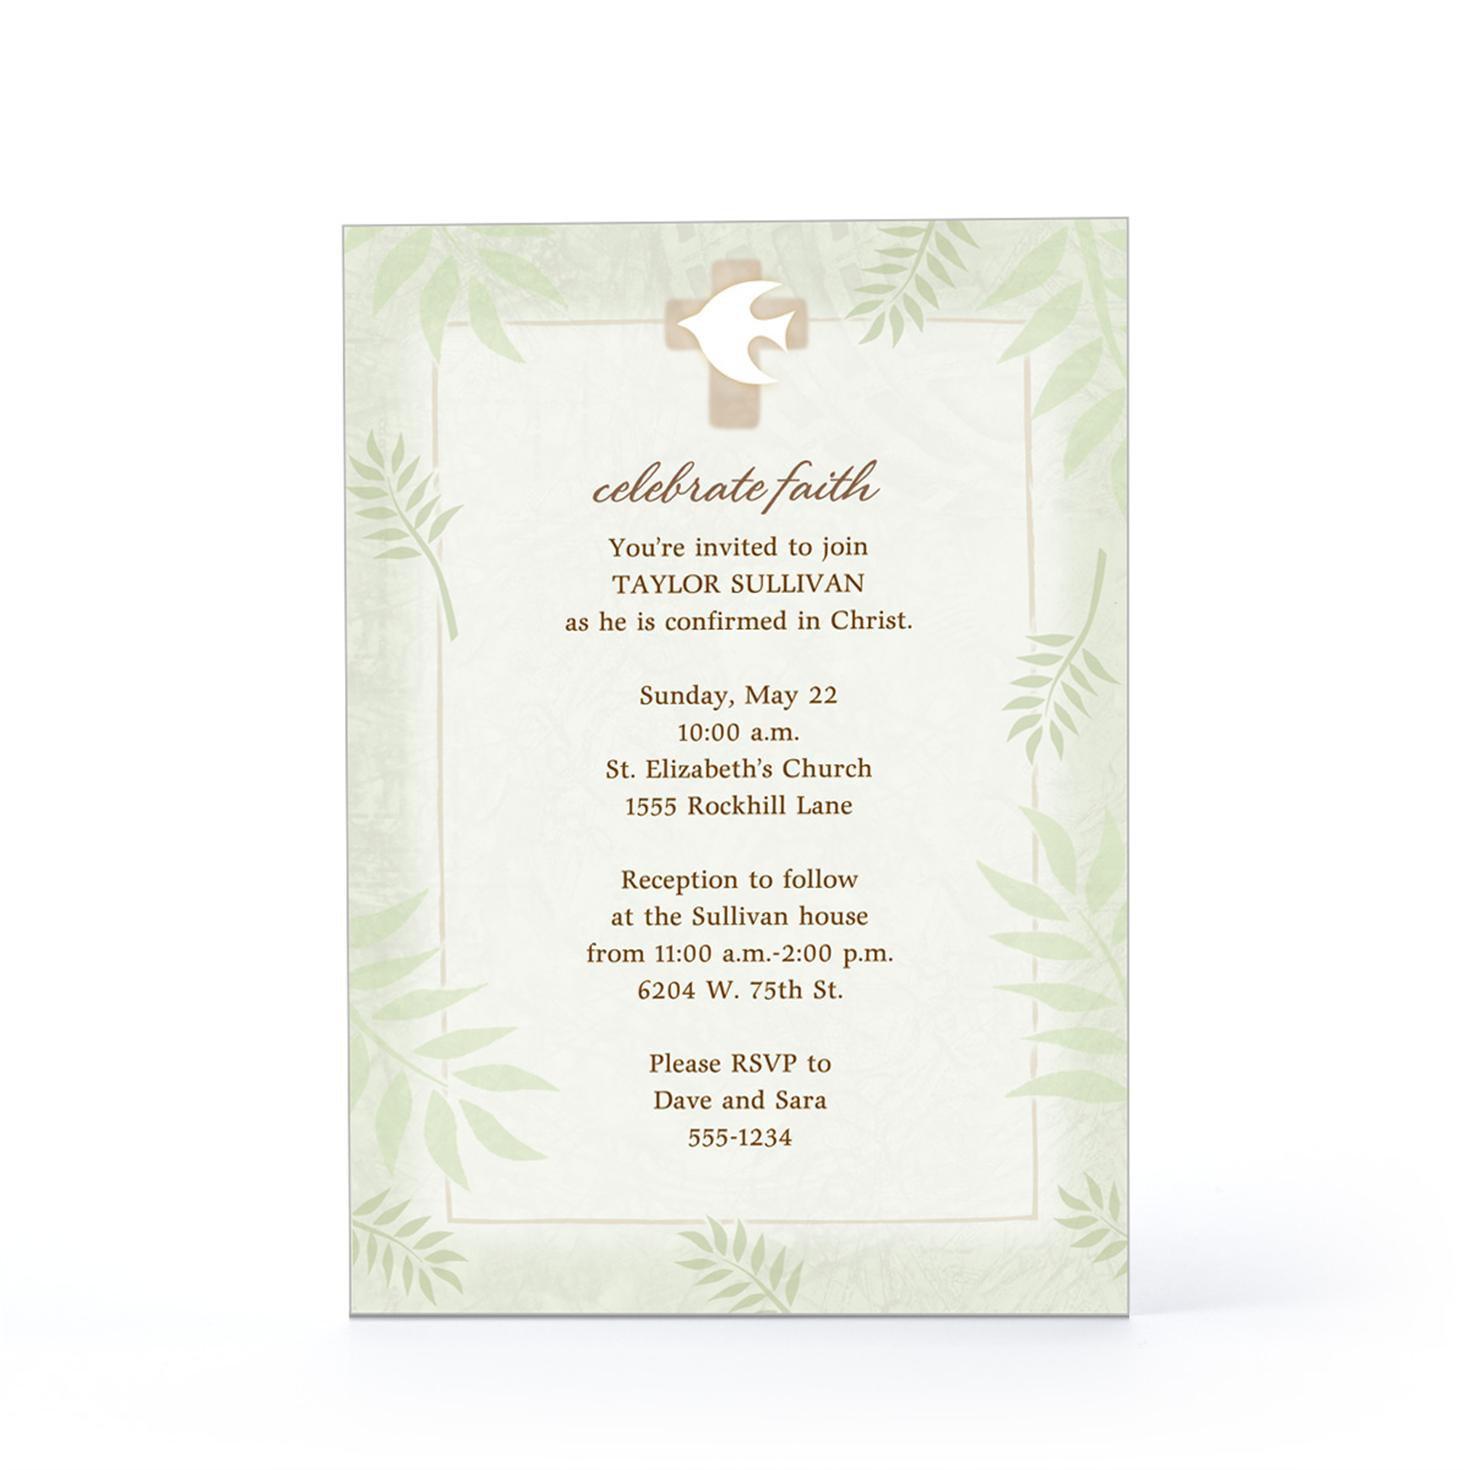 Wedding Invitations By Hallmark New